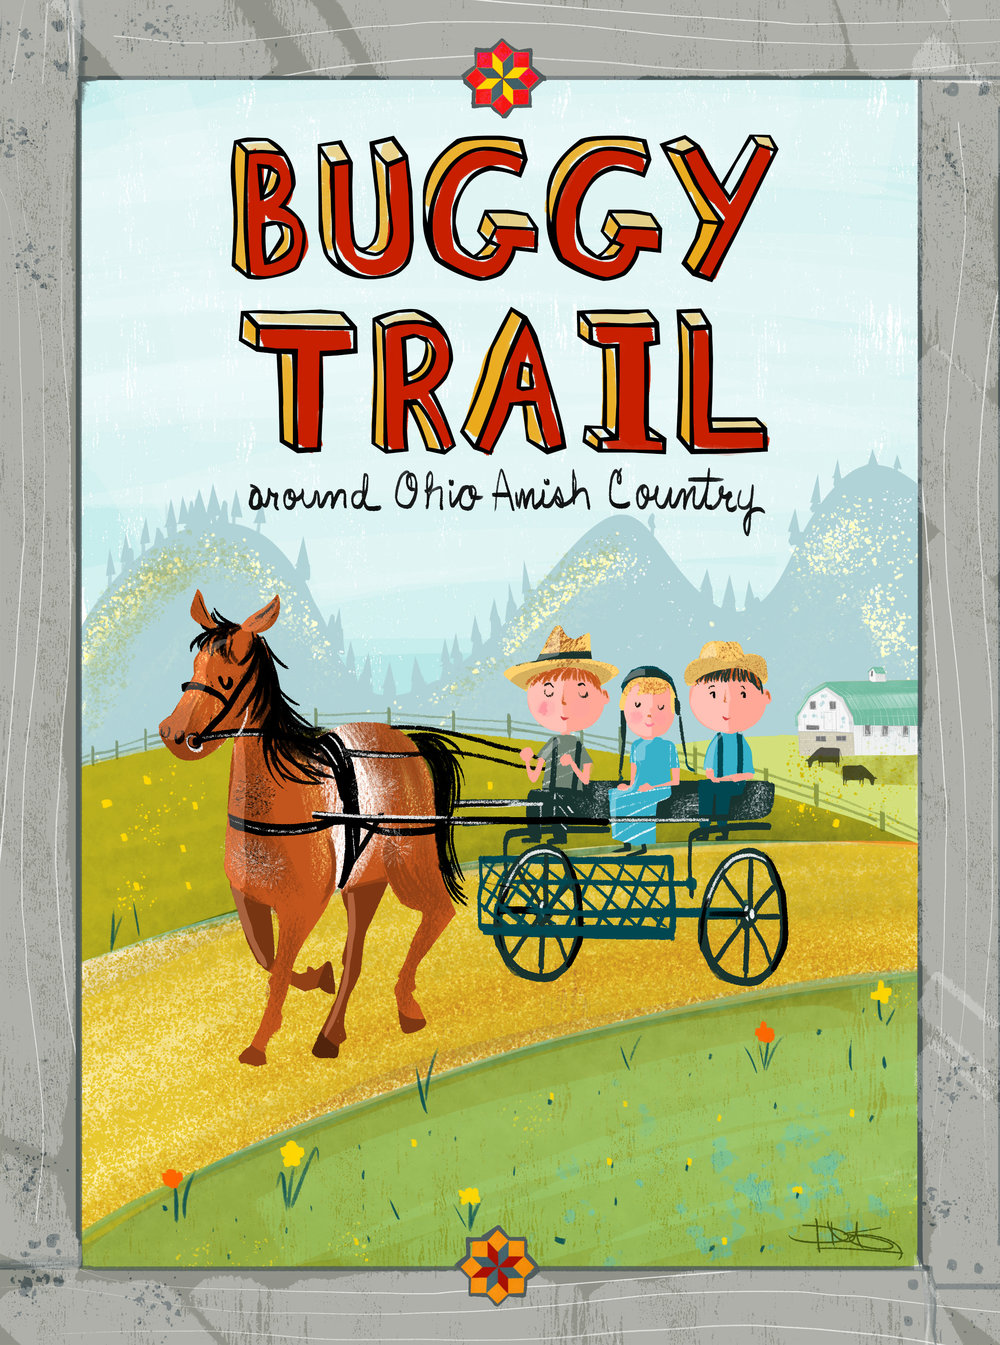 buggy cover 4.1.18.jpg